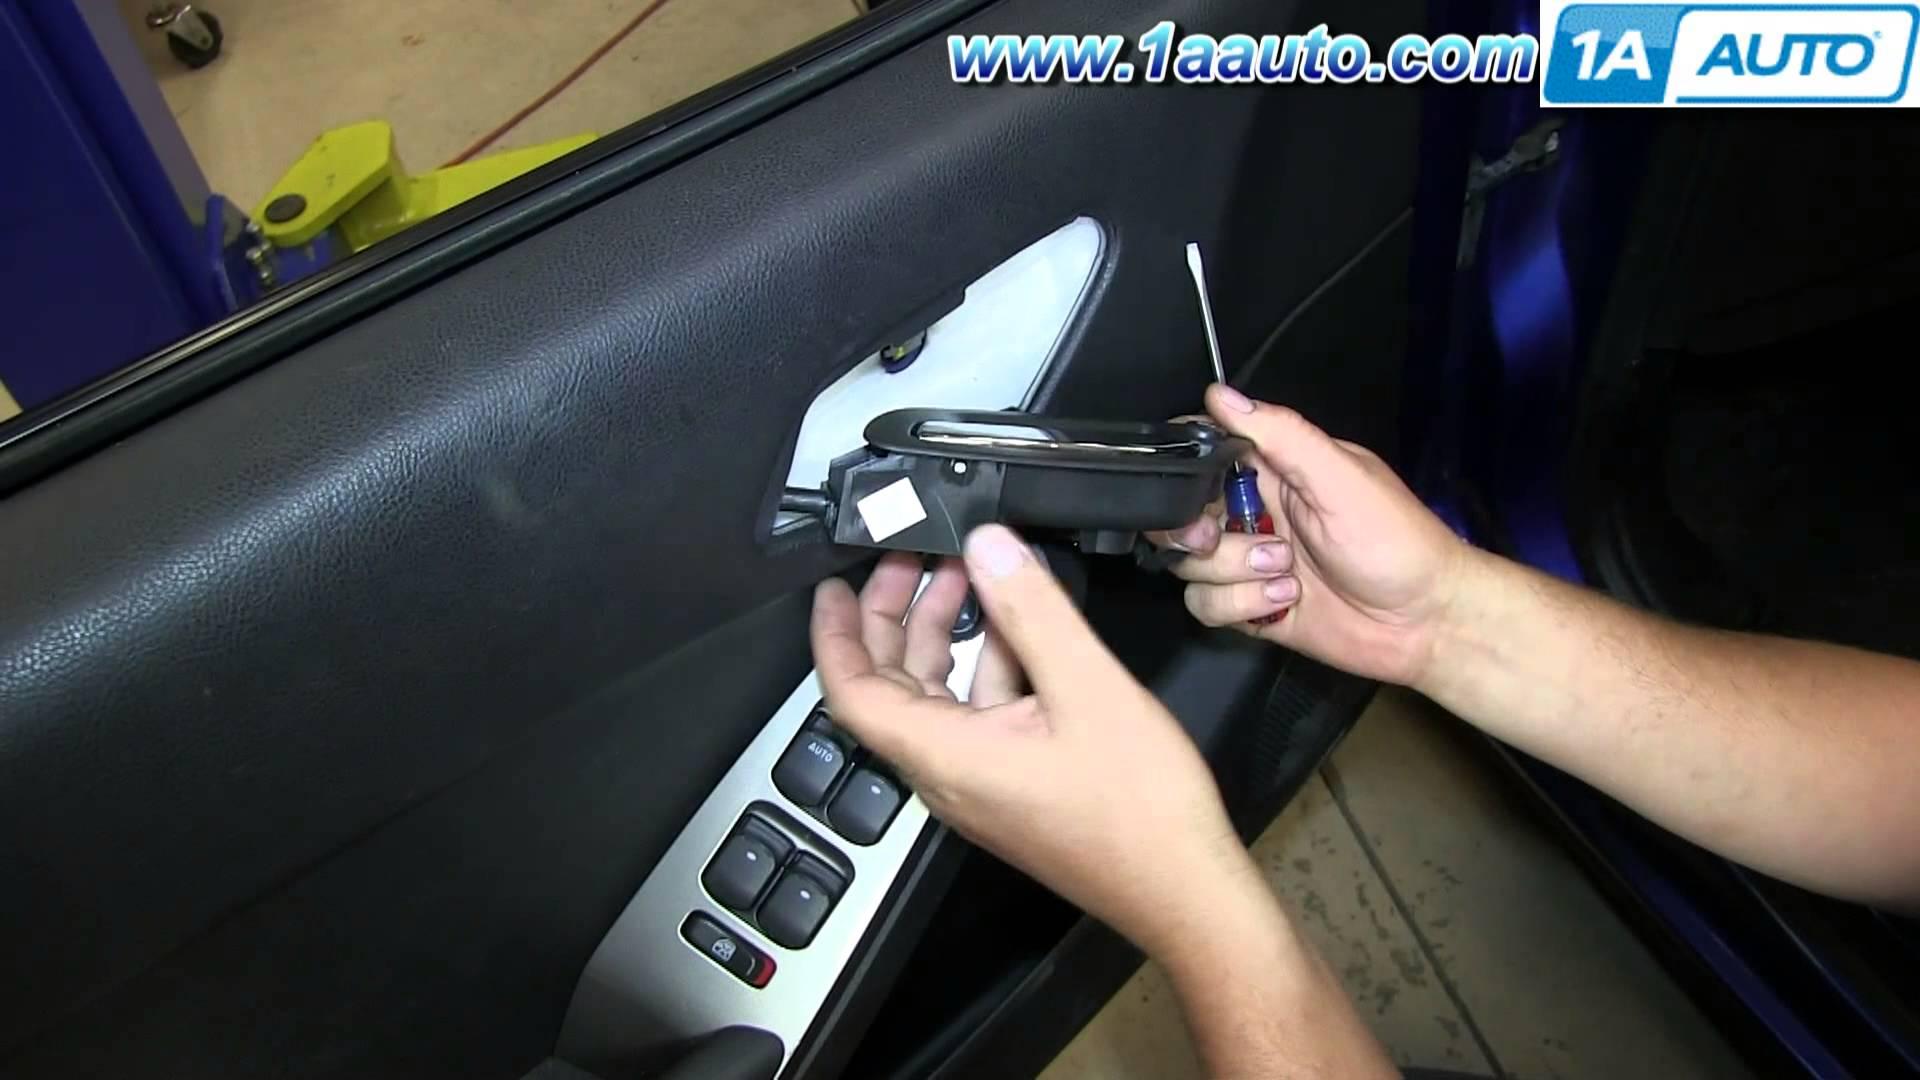 door knob latch problems photo - 19